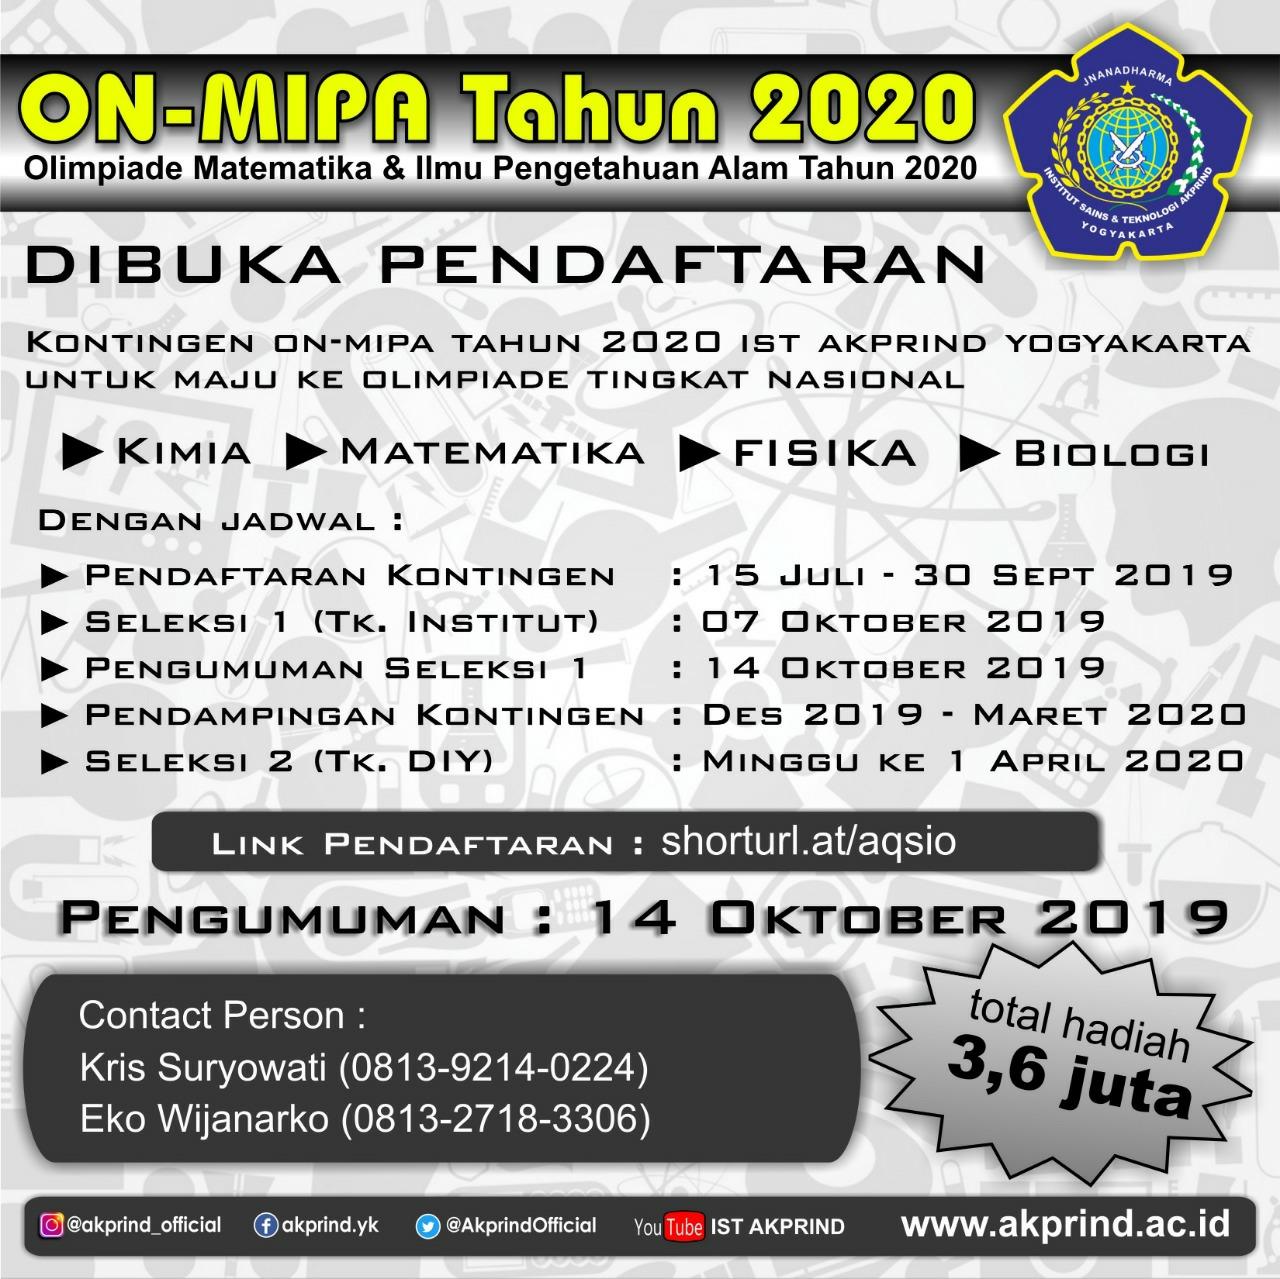 PENGUMUMAN: Seleksi ON-MIPA 2020 Telah Dibuka